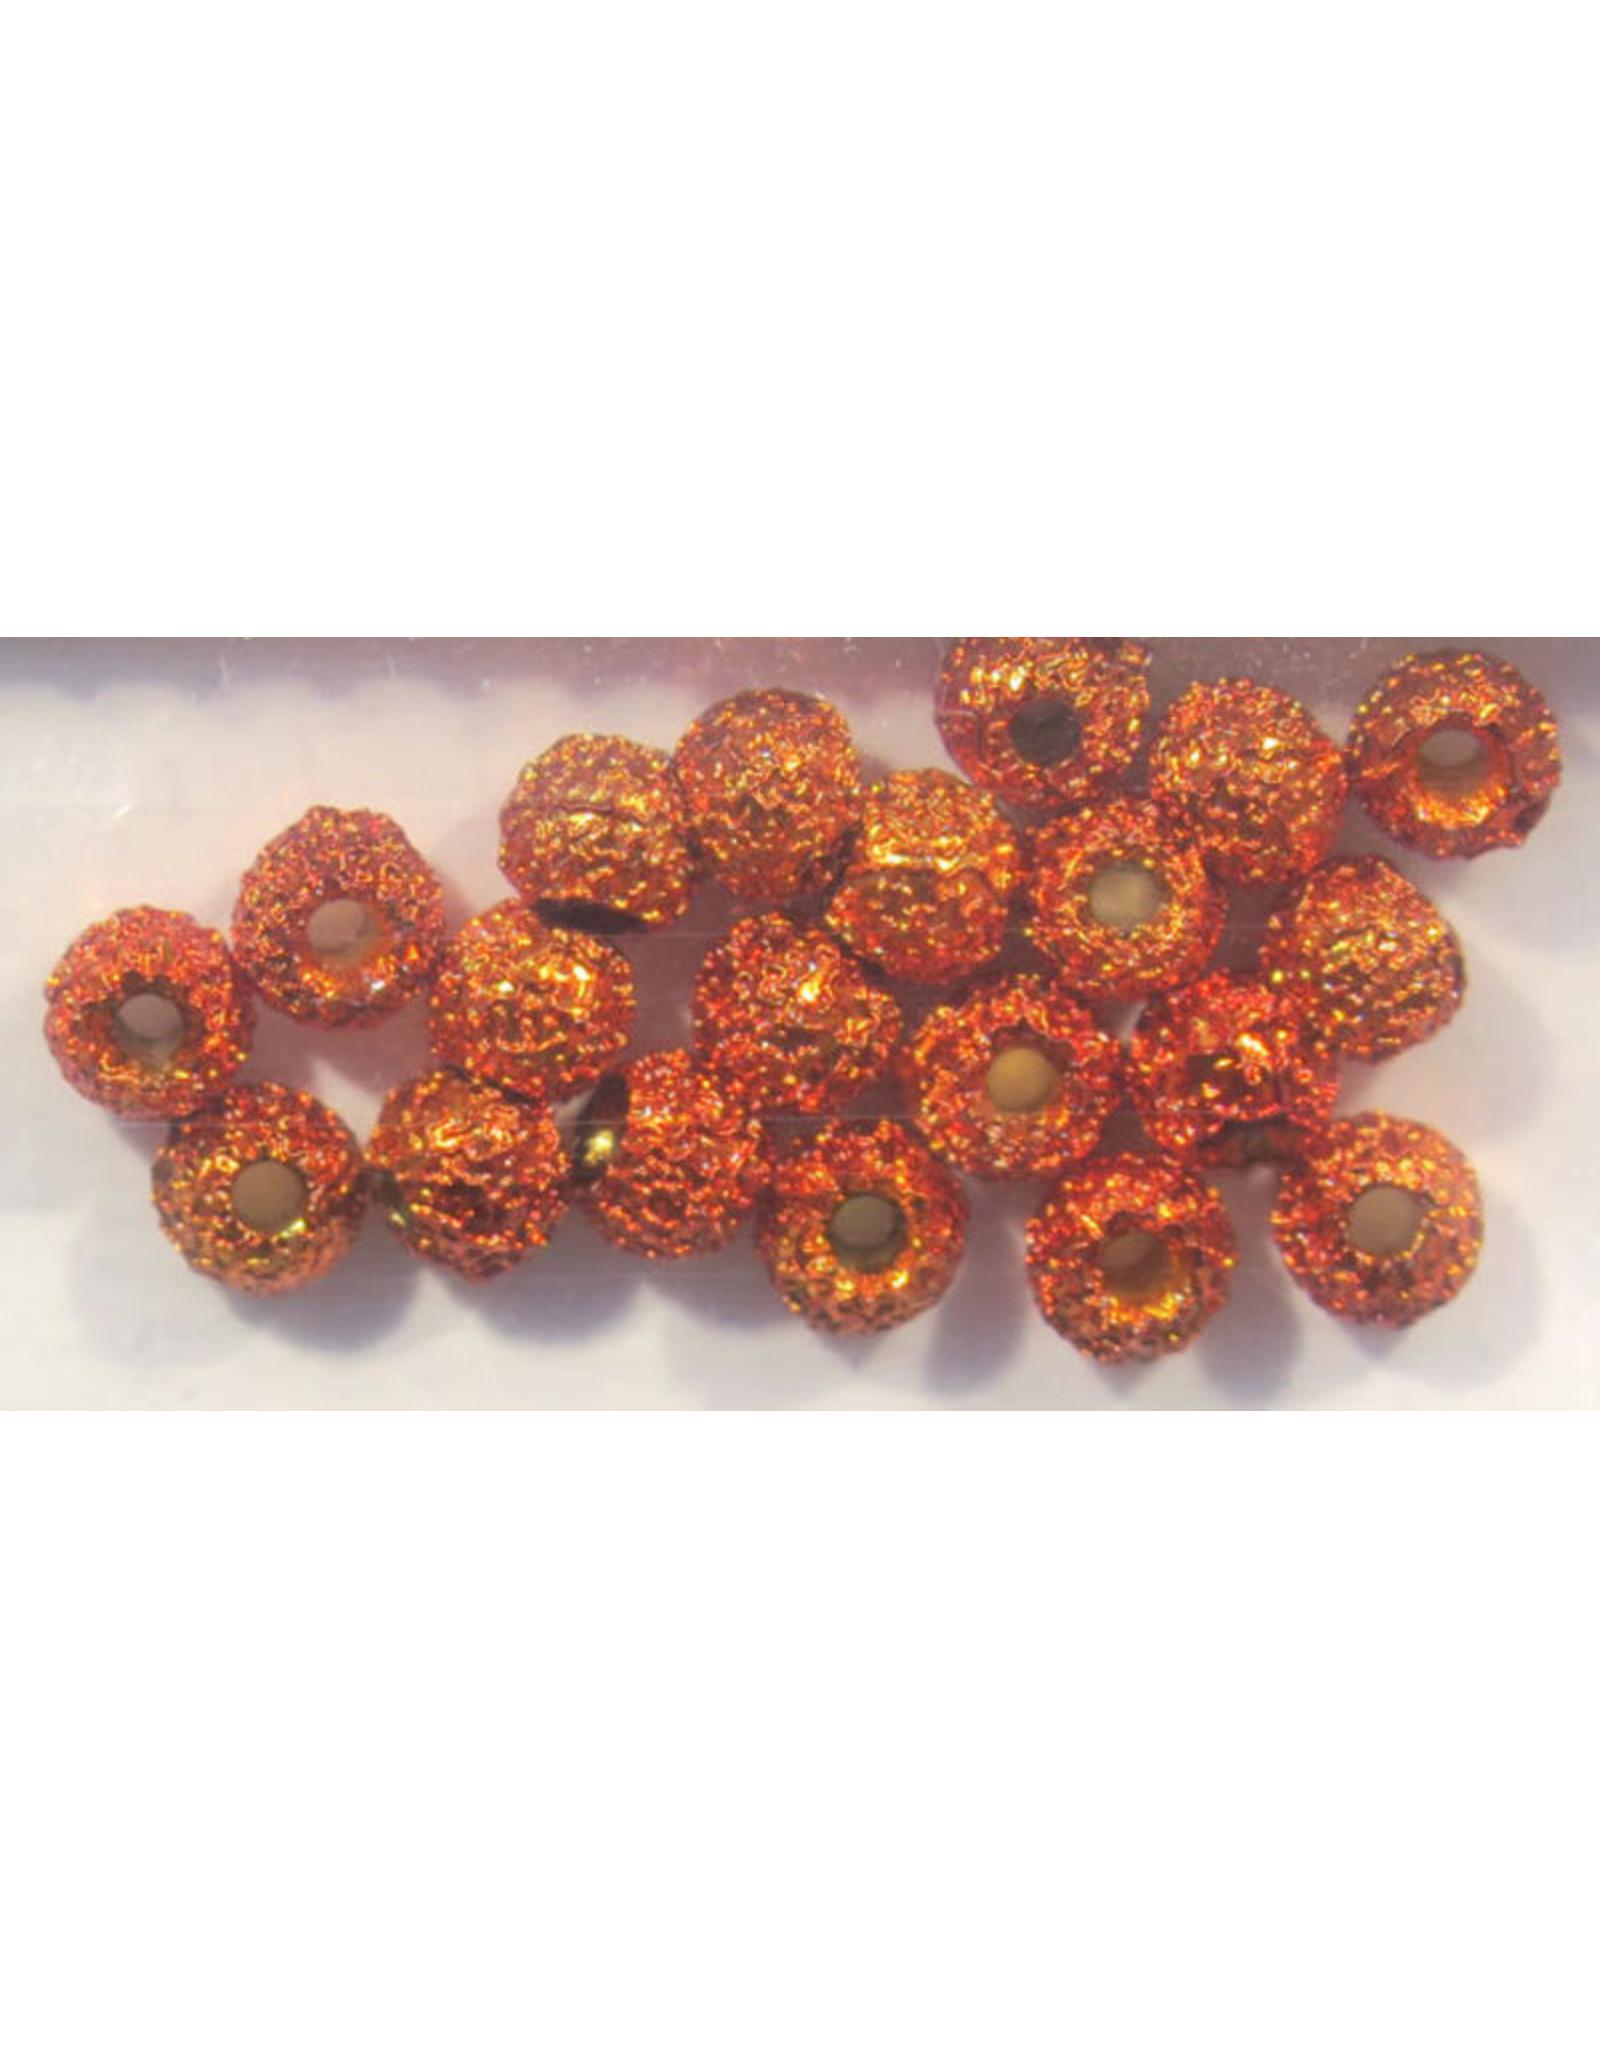 HARELINE DUBBIN Gritty Brass Beads